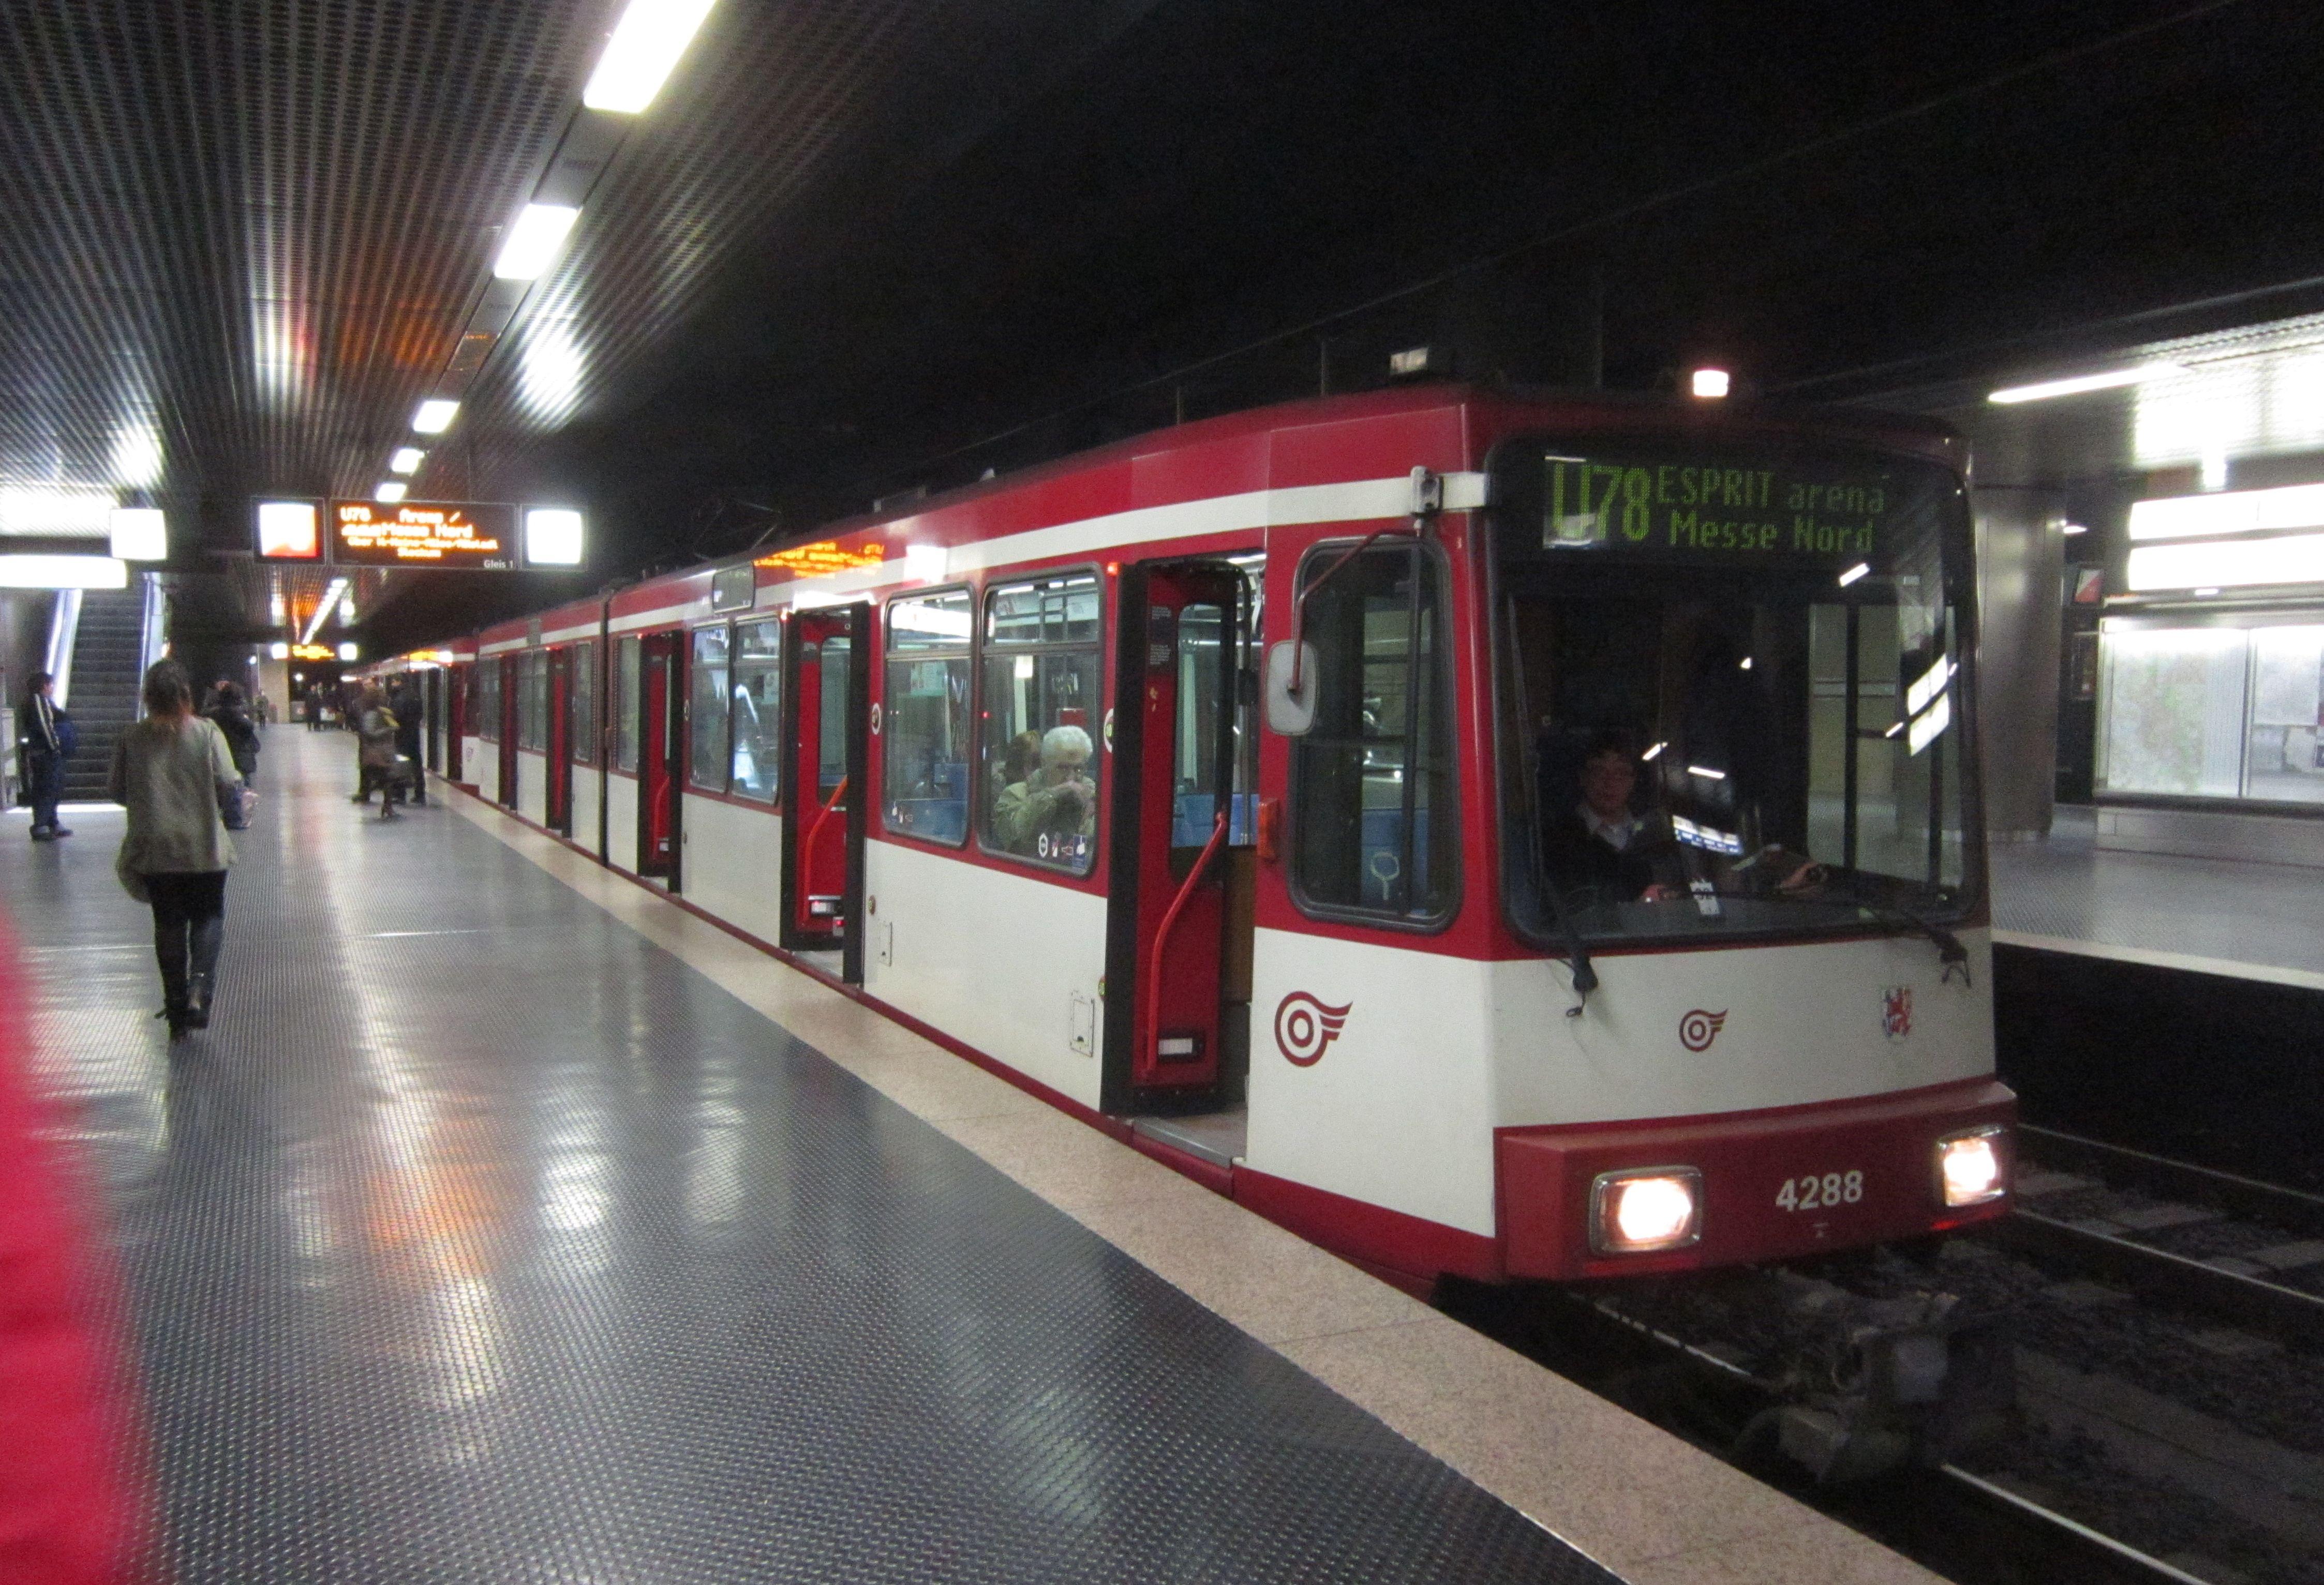 Blennemann Duisburg düsseldorf stadtbahn - wikipedia